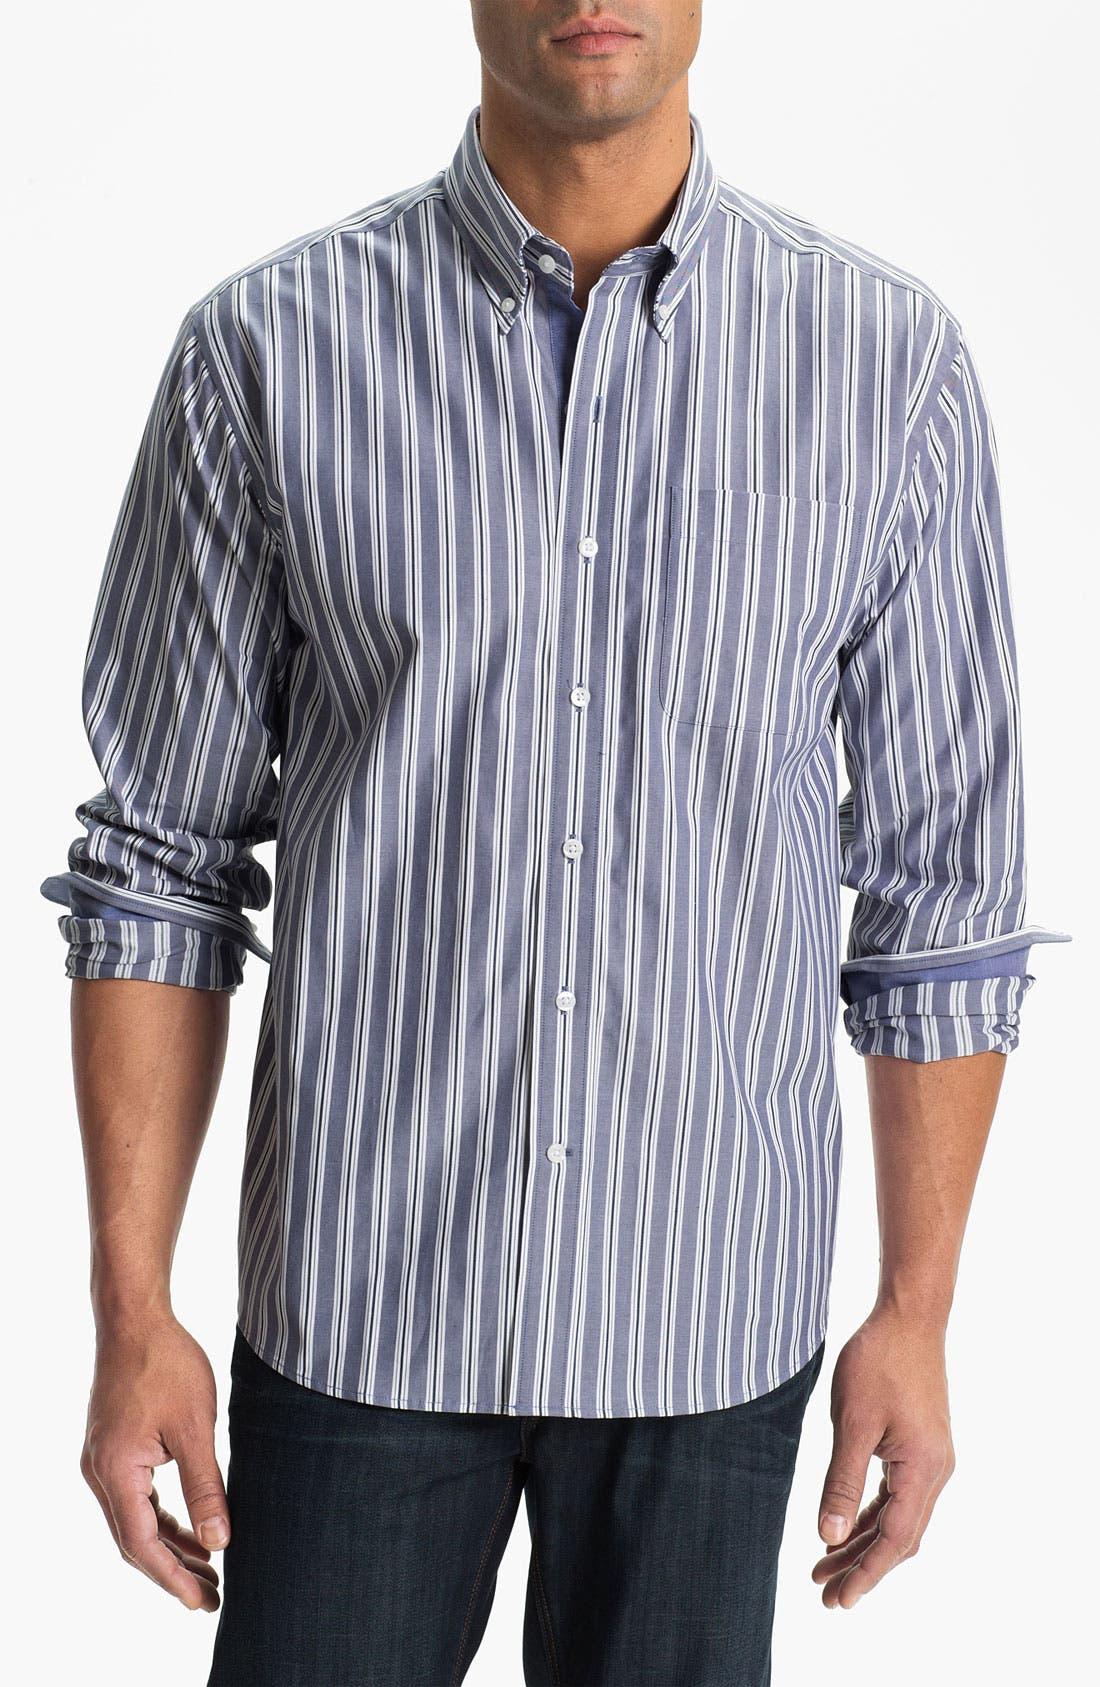 Main Image - Cutter & Buck 'Atherton Stripe' Regular Fit Sport Shirt (Big & Tall)